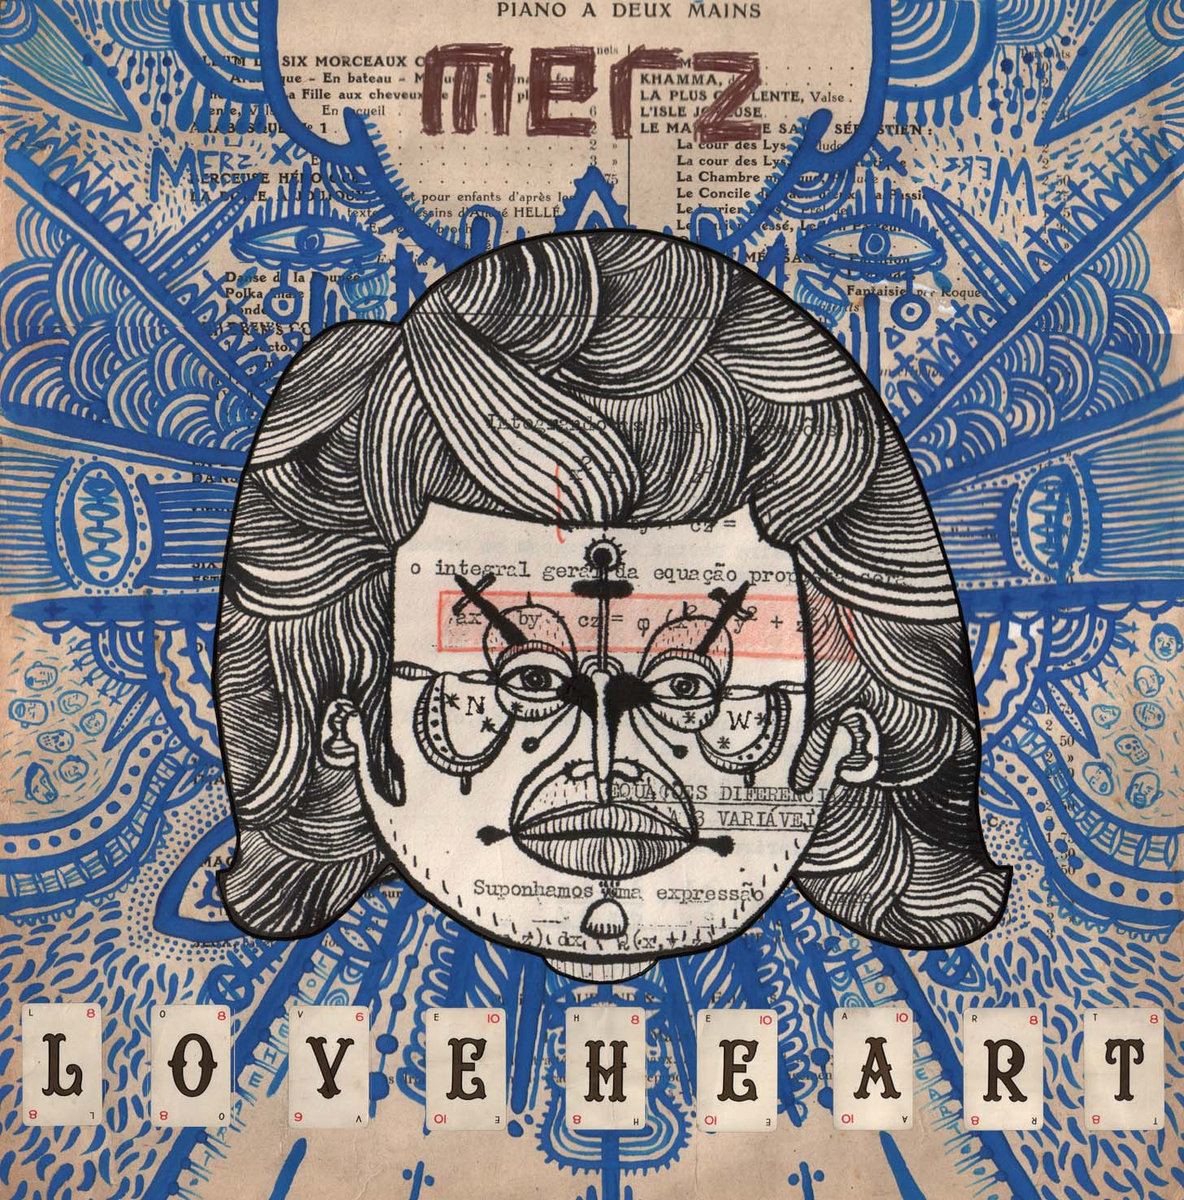 Merz: Loveheart